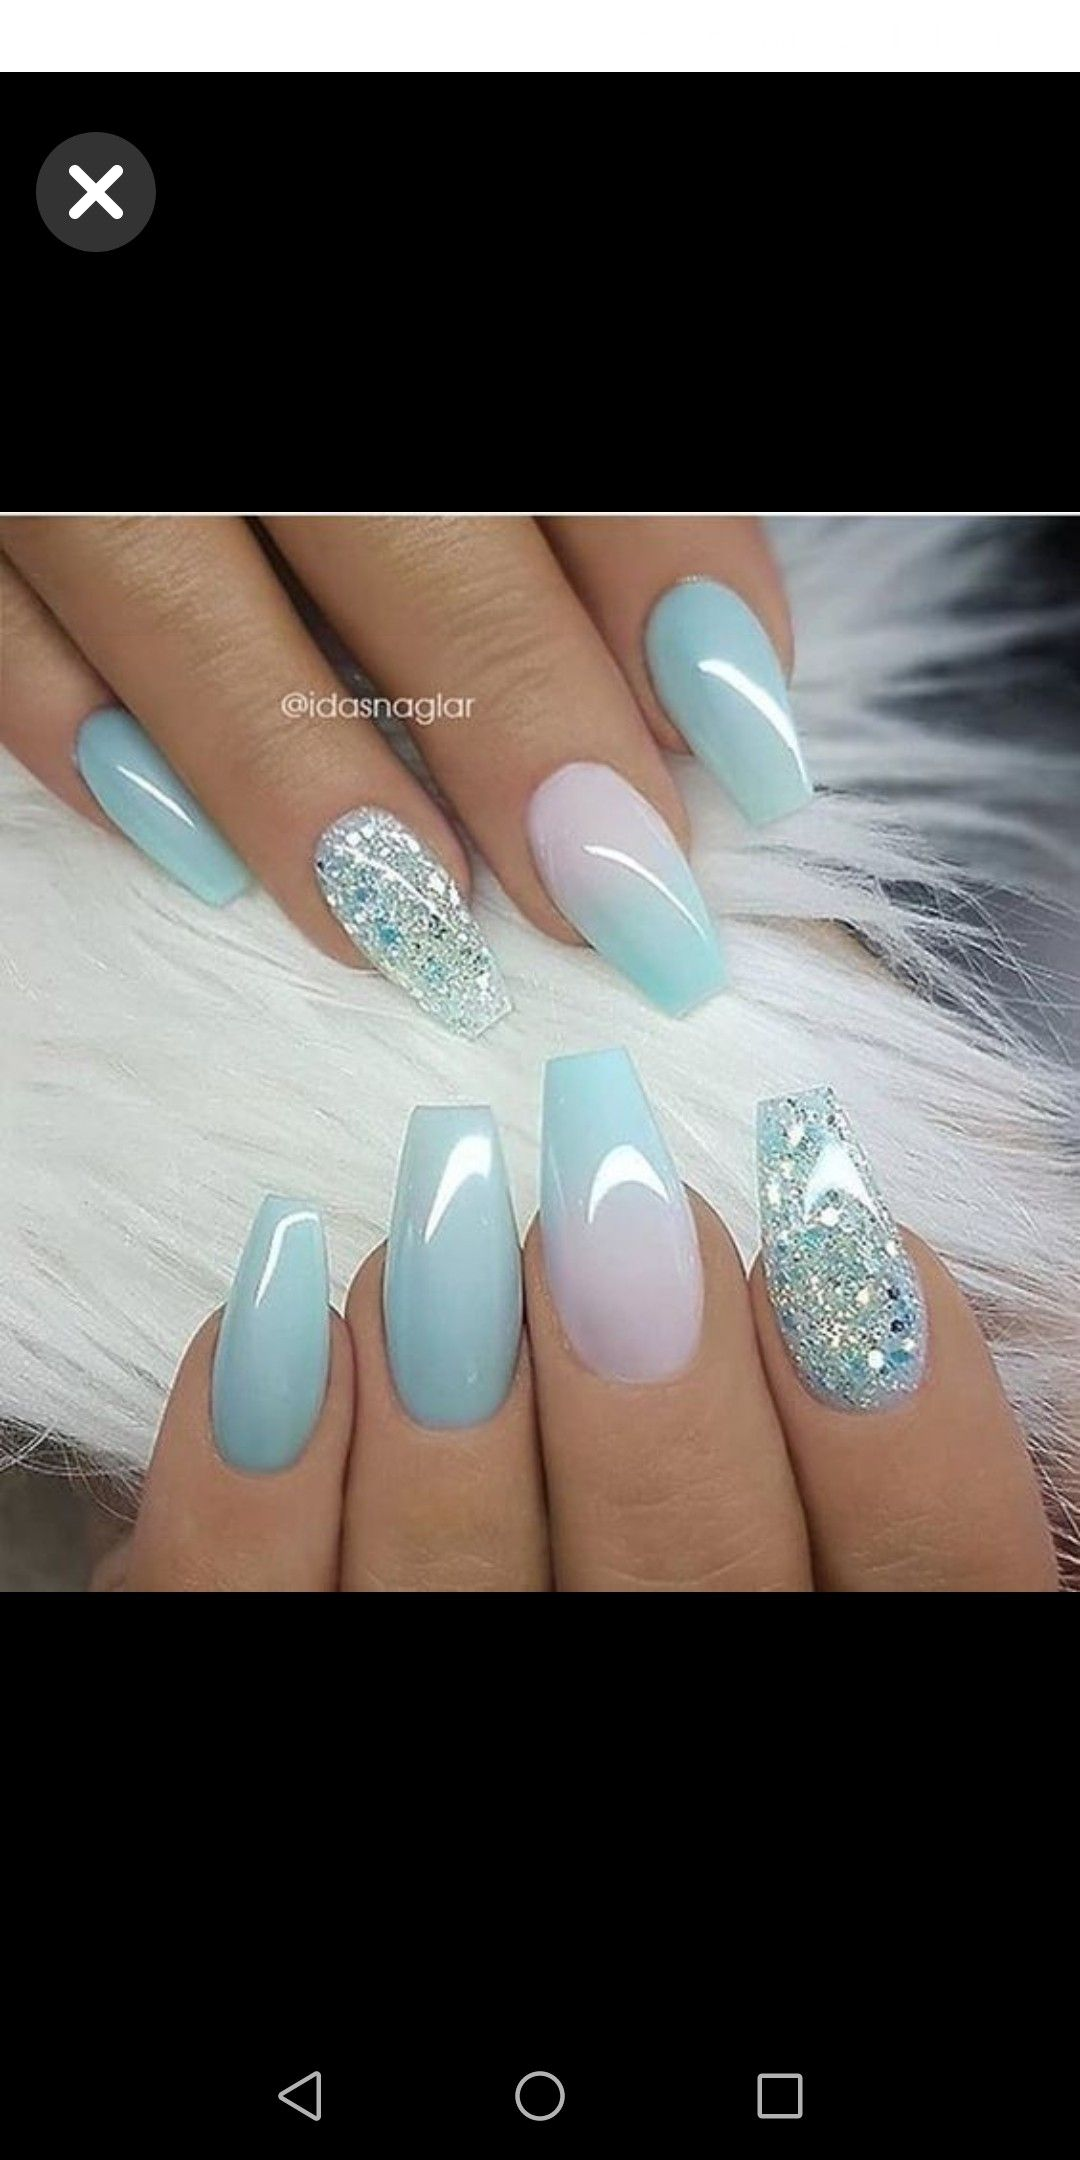 Pin By Beruska Sedmitecna On Nails With Images Design Nehtu Barevne Nehty Gelove Nehty